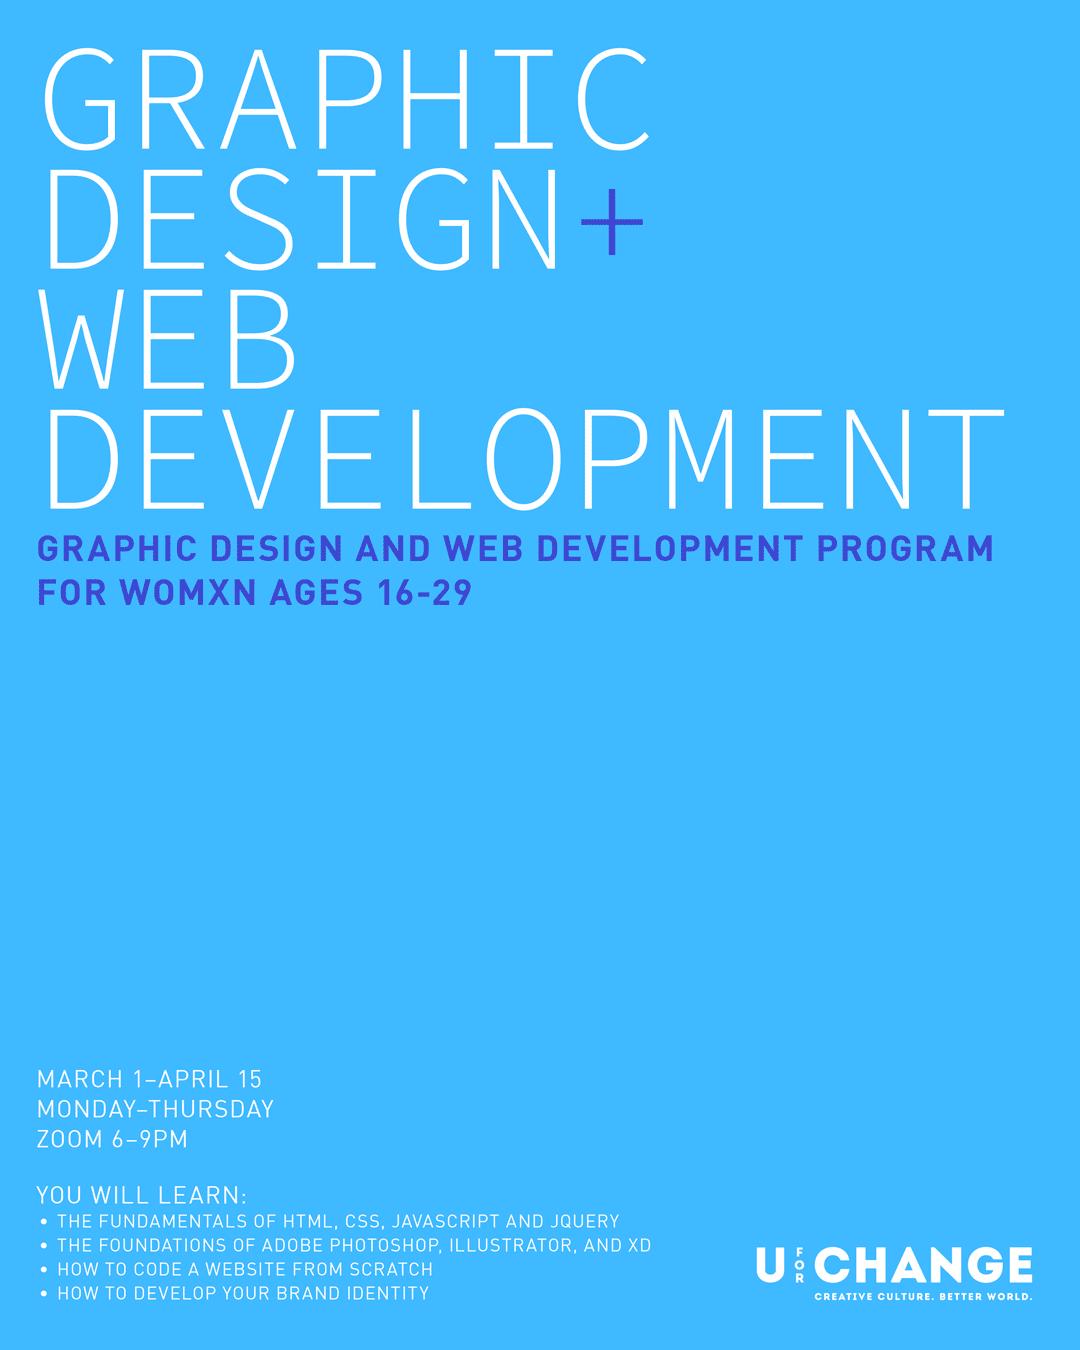 graphic design and web development poster